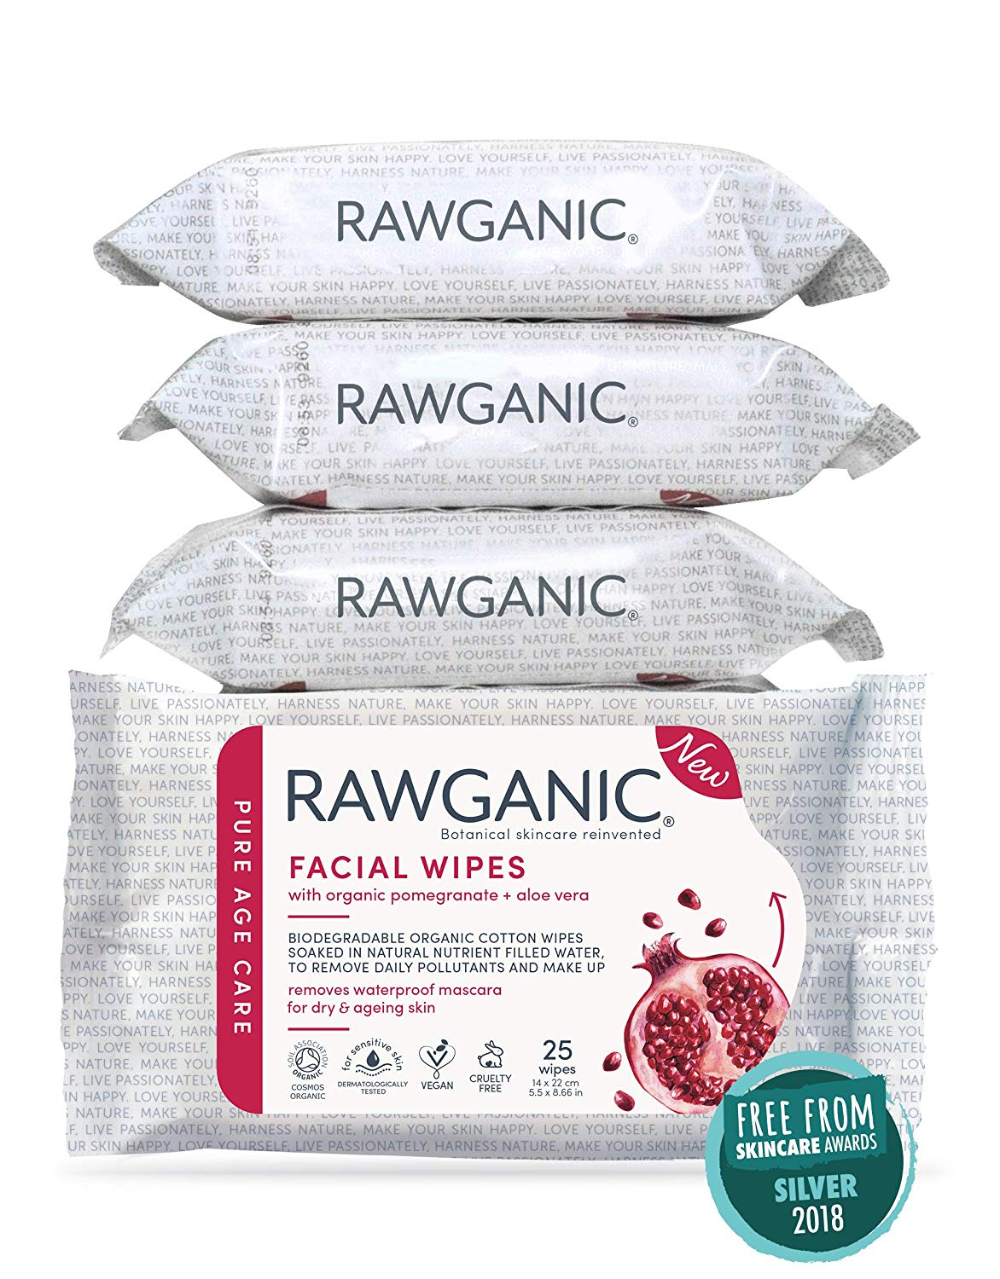 RAWGANIC Antiaging Facial Wipes Gentle Hydrating